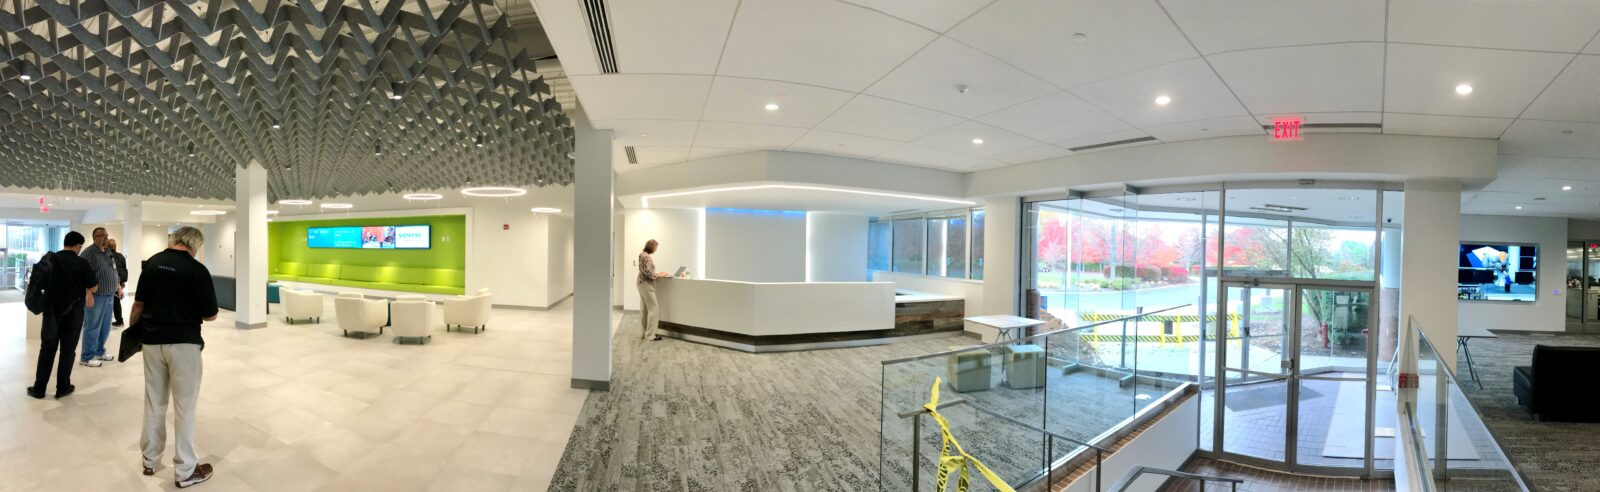 Siemens CT Lobby